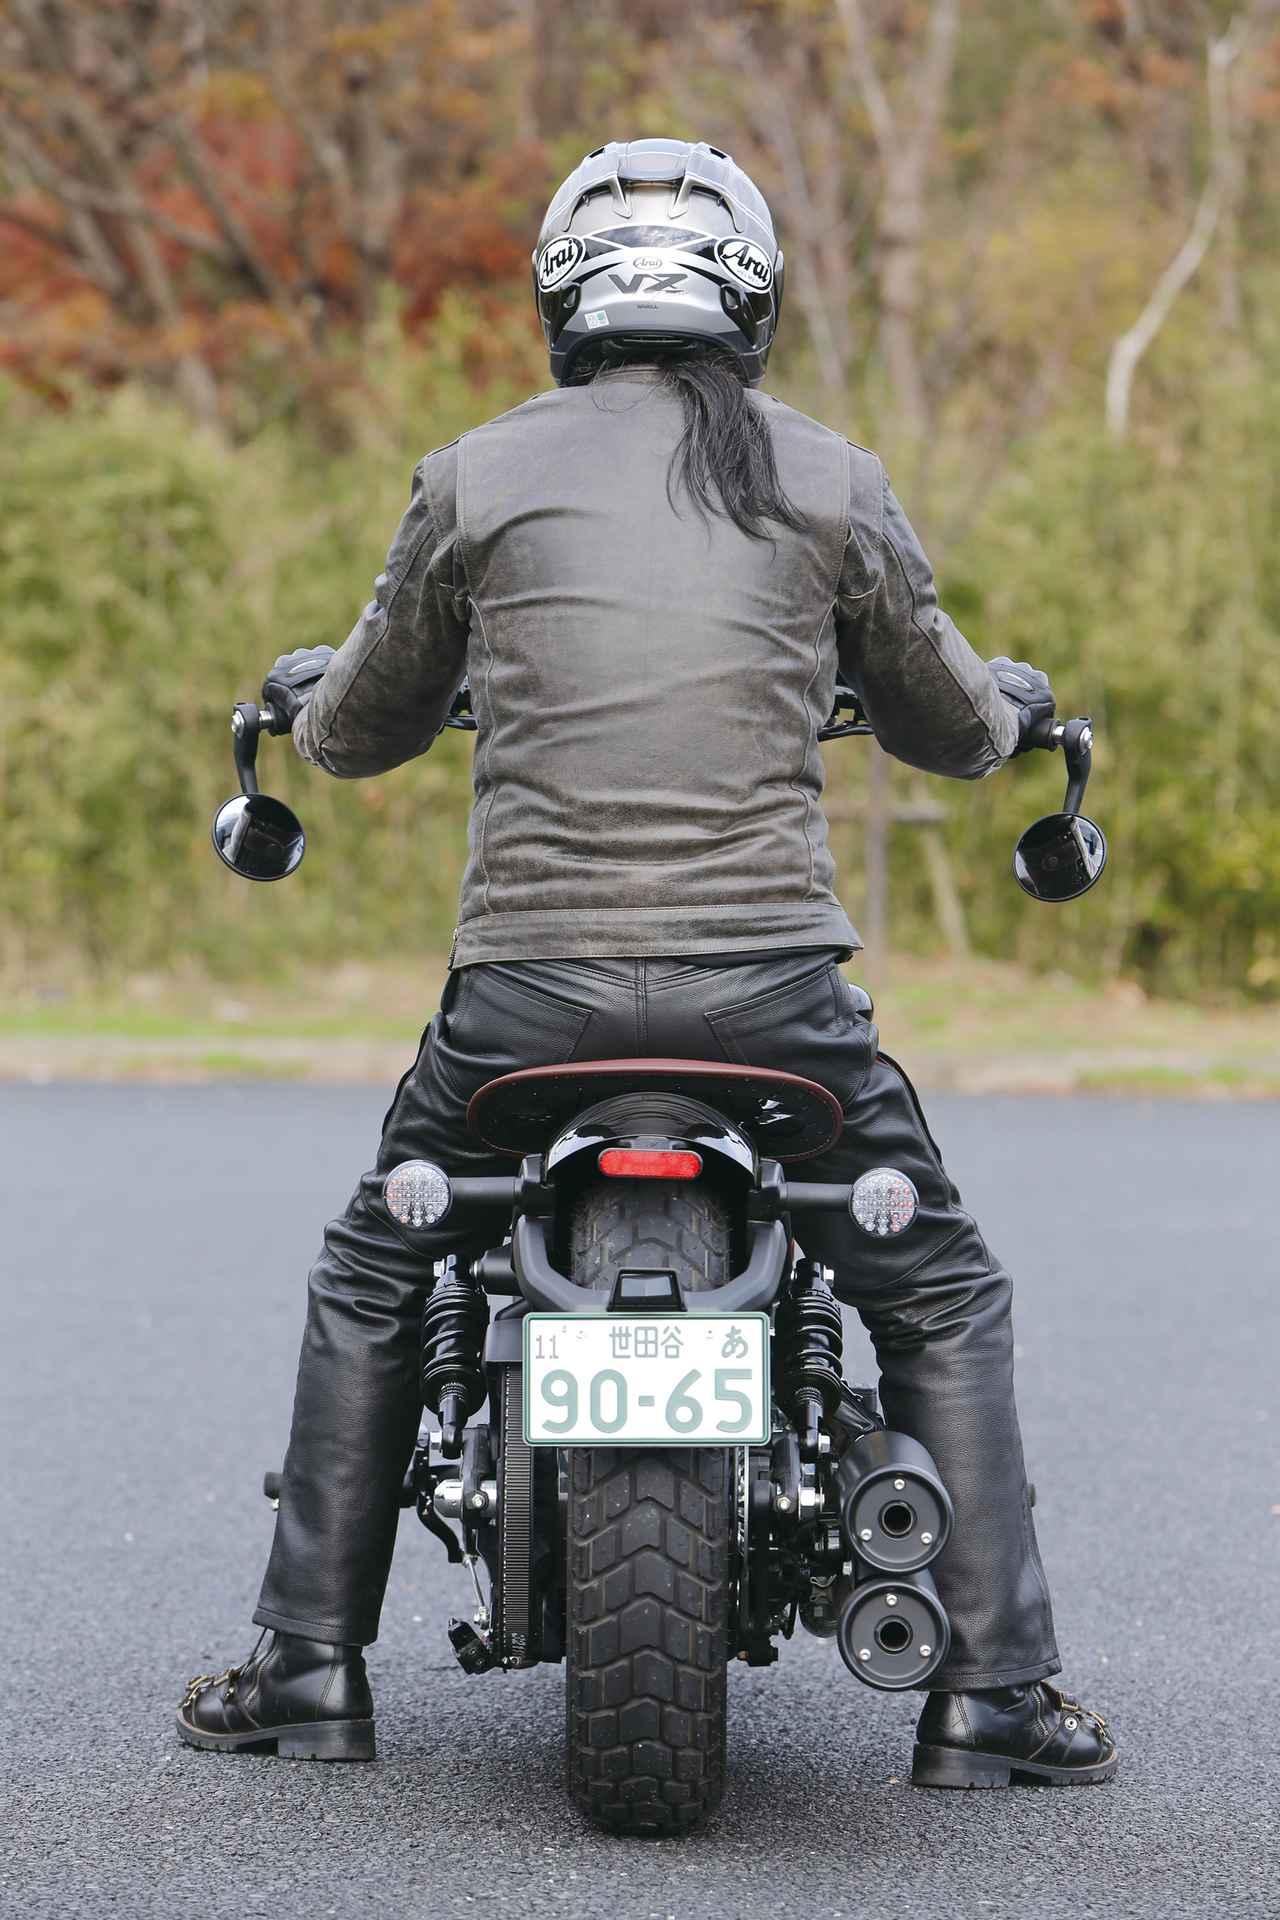 Images : 10番目の画像 - スカウトボバー トゥウェンティの写真をまとめて見る! - webオートバイ